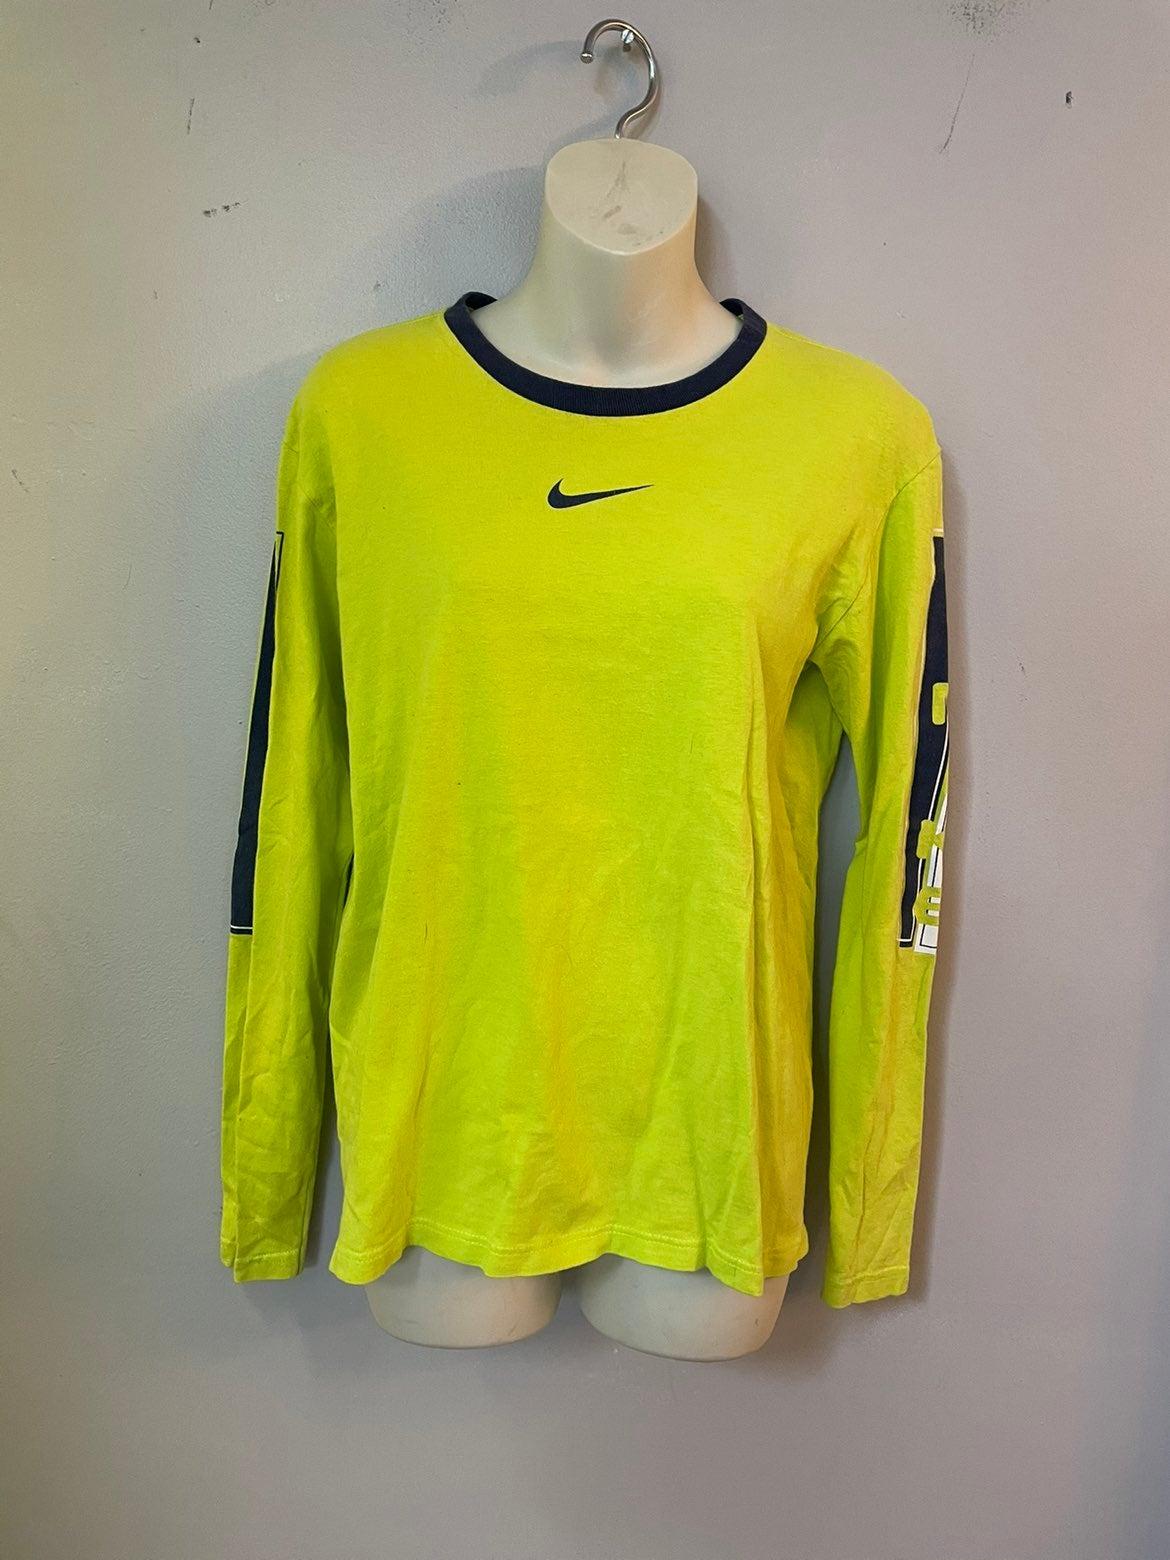 Nike vintage neon green shirt YM or XS/S